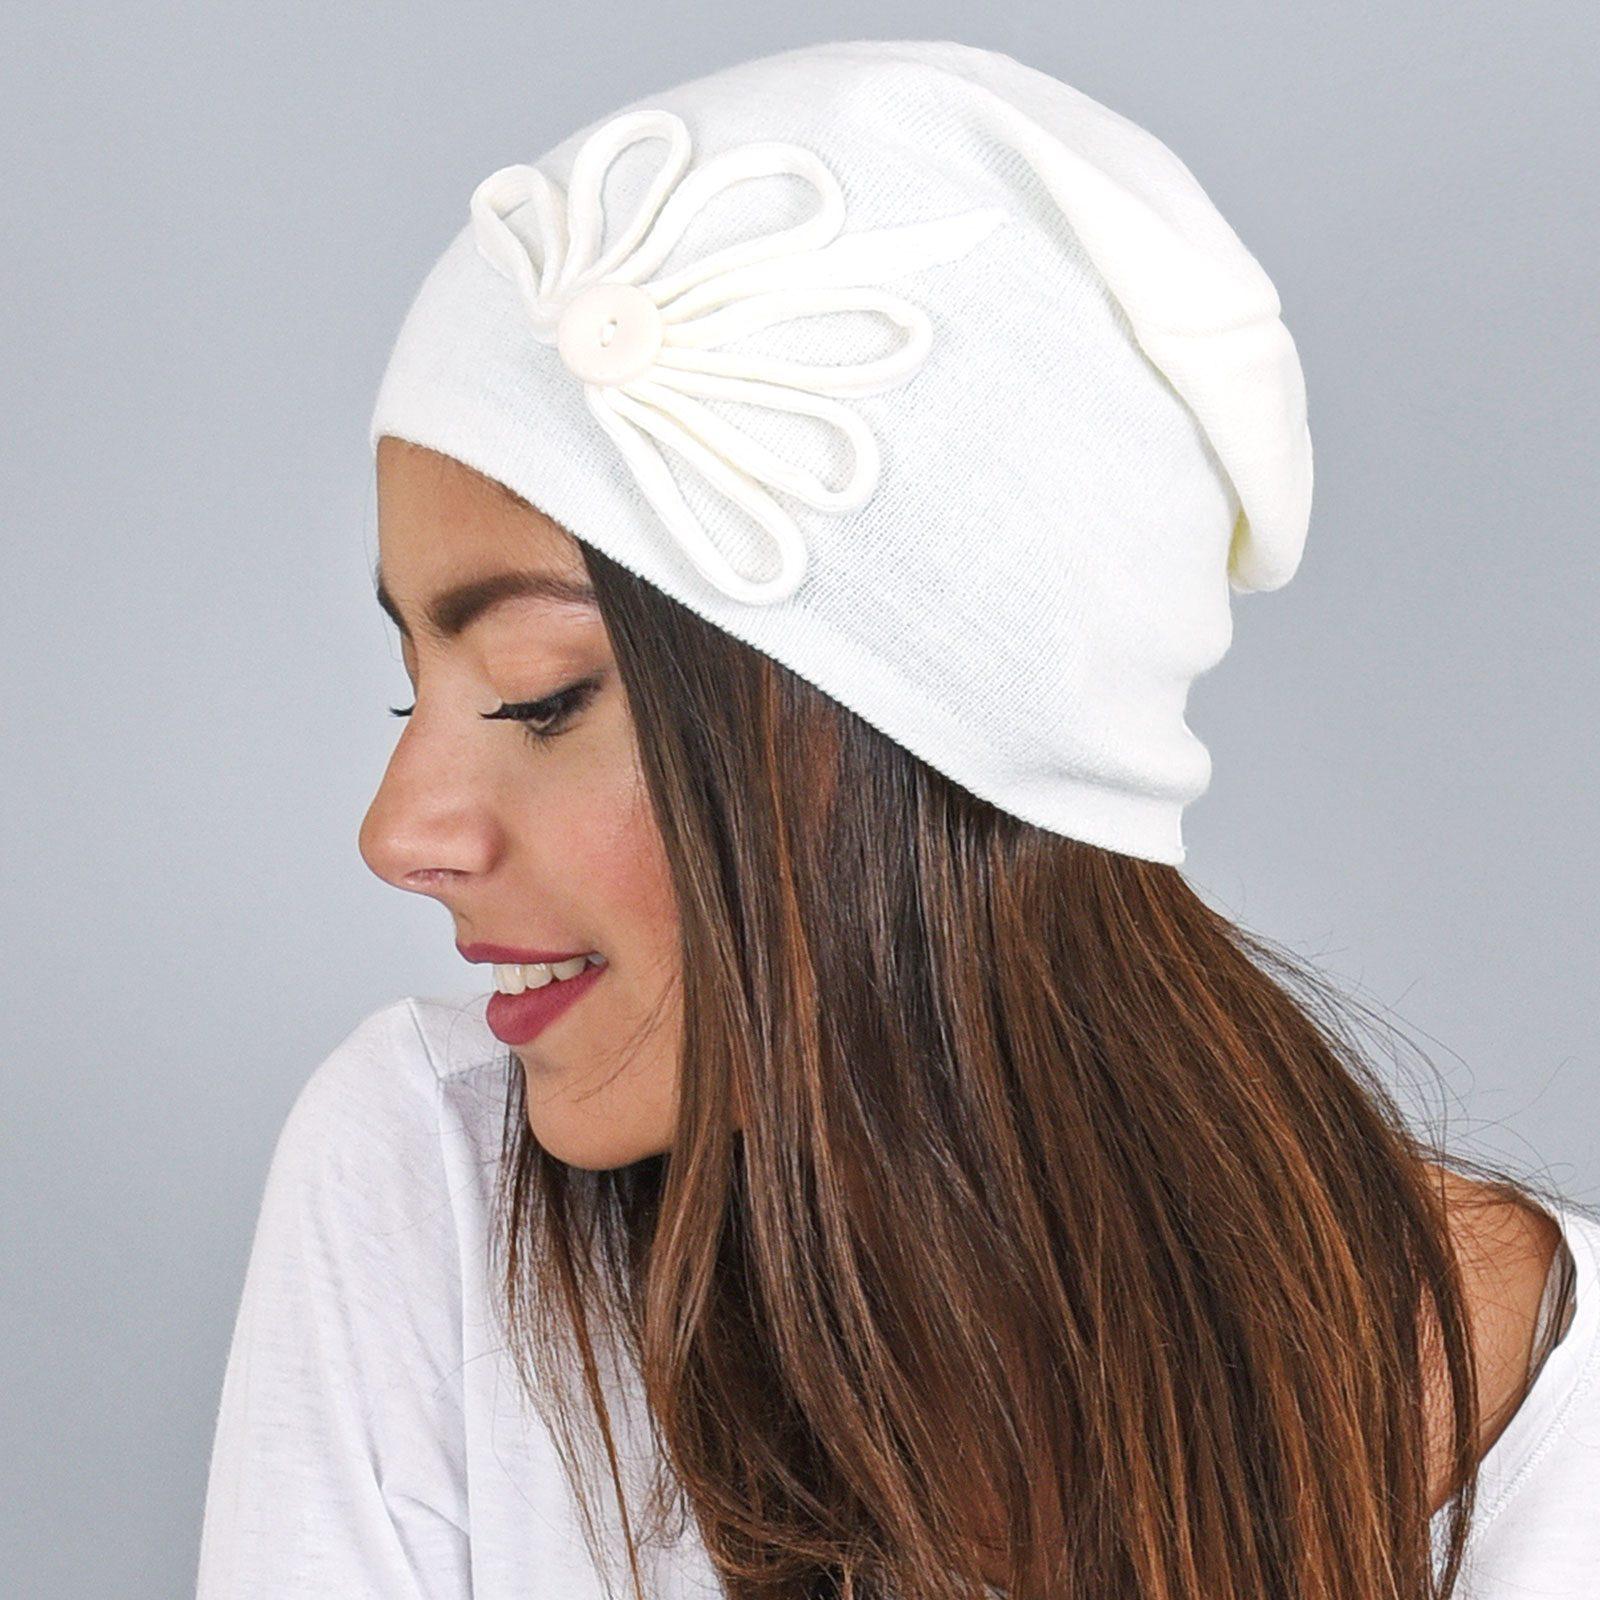 http://lookbook.allee-du-foulard.fr/wp-content/uploads/2019/01/CP-00802-VF16-2-bonnet-femme-bouton-blanc-1600x1600.jpg